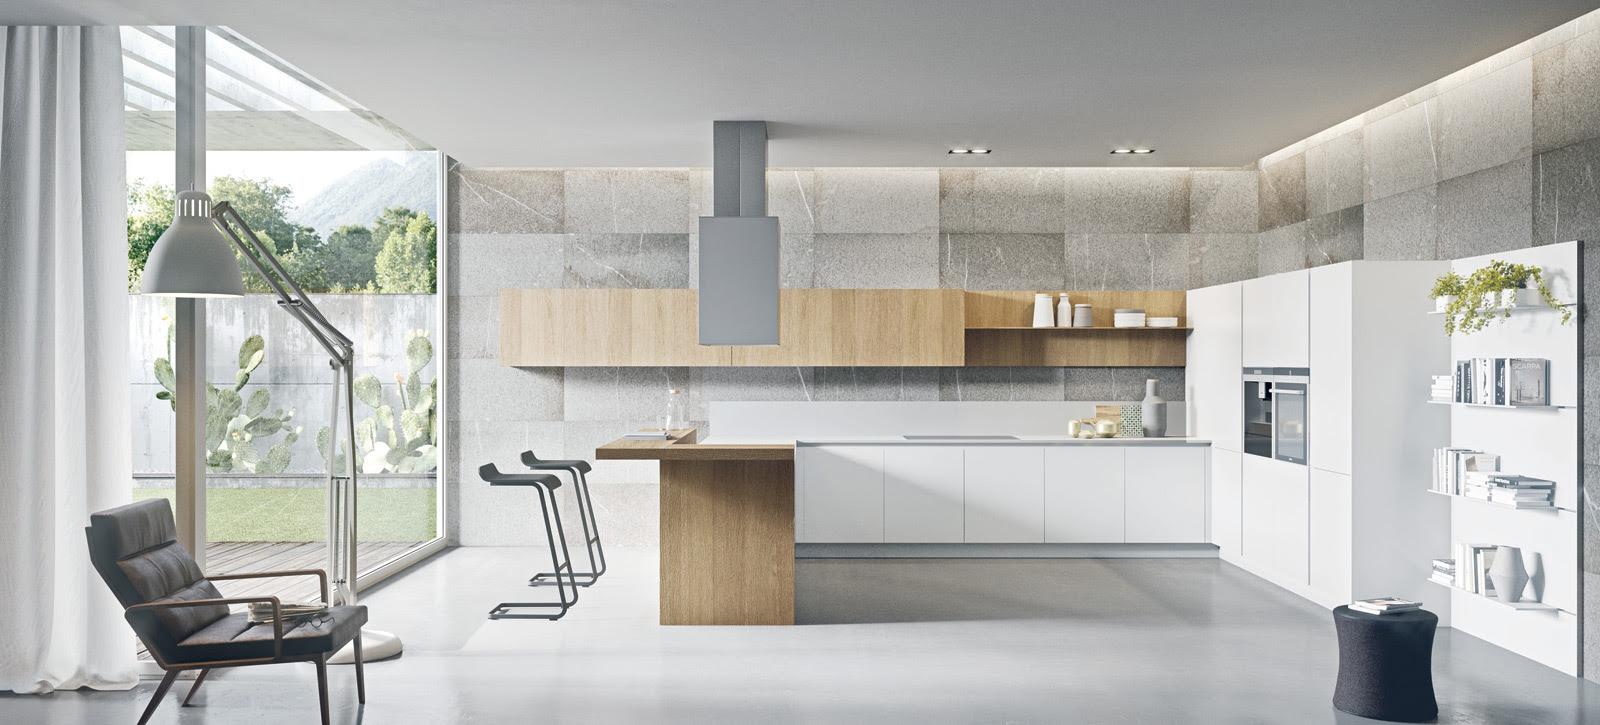 Italian Kitchen Designs | EuroMobil | CopatLife | Chicago